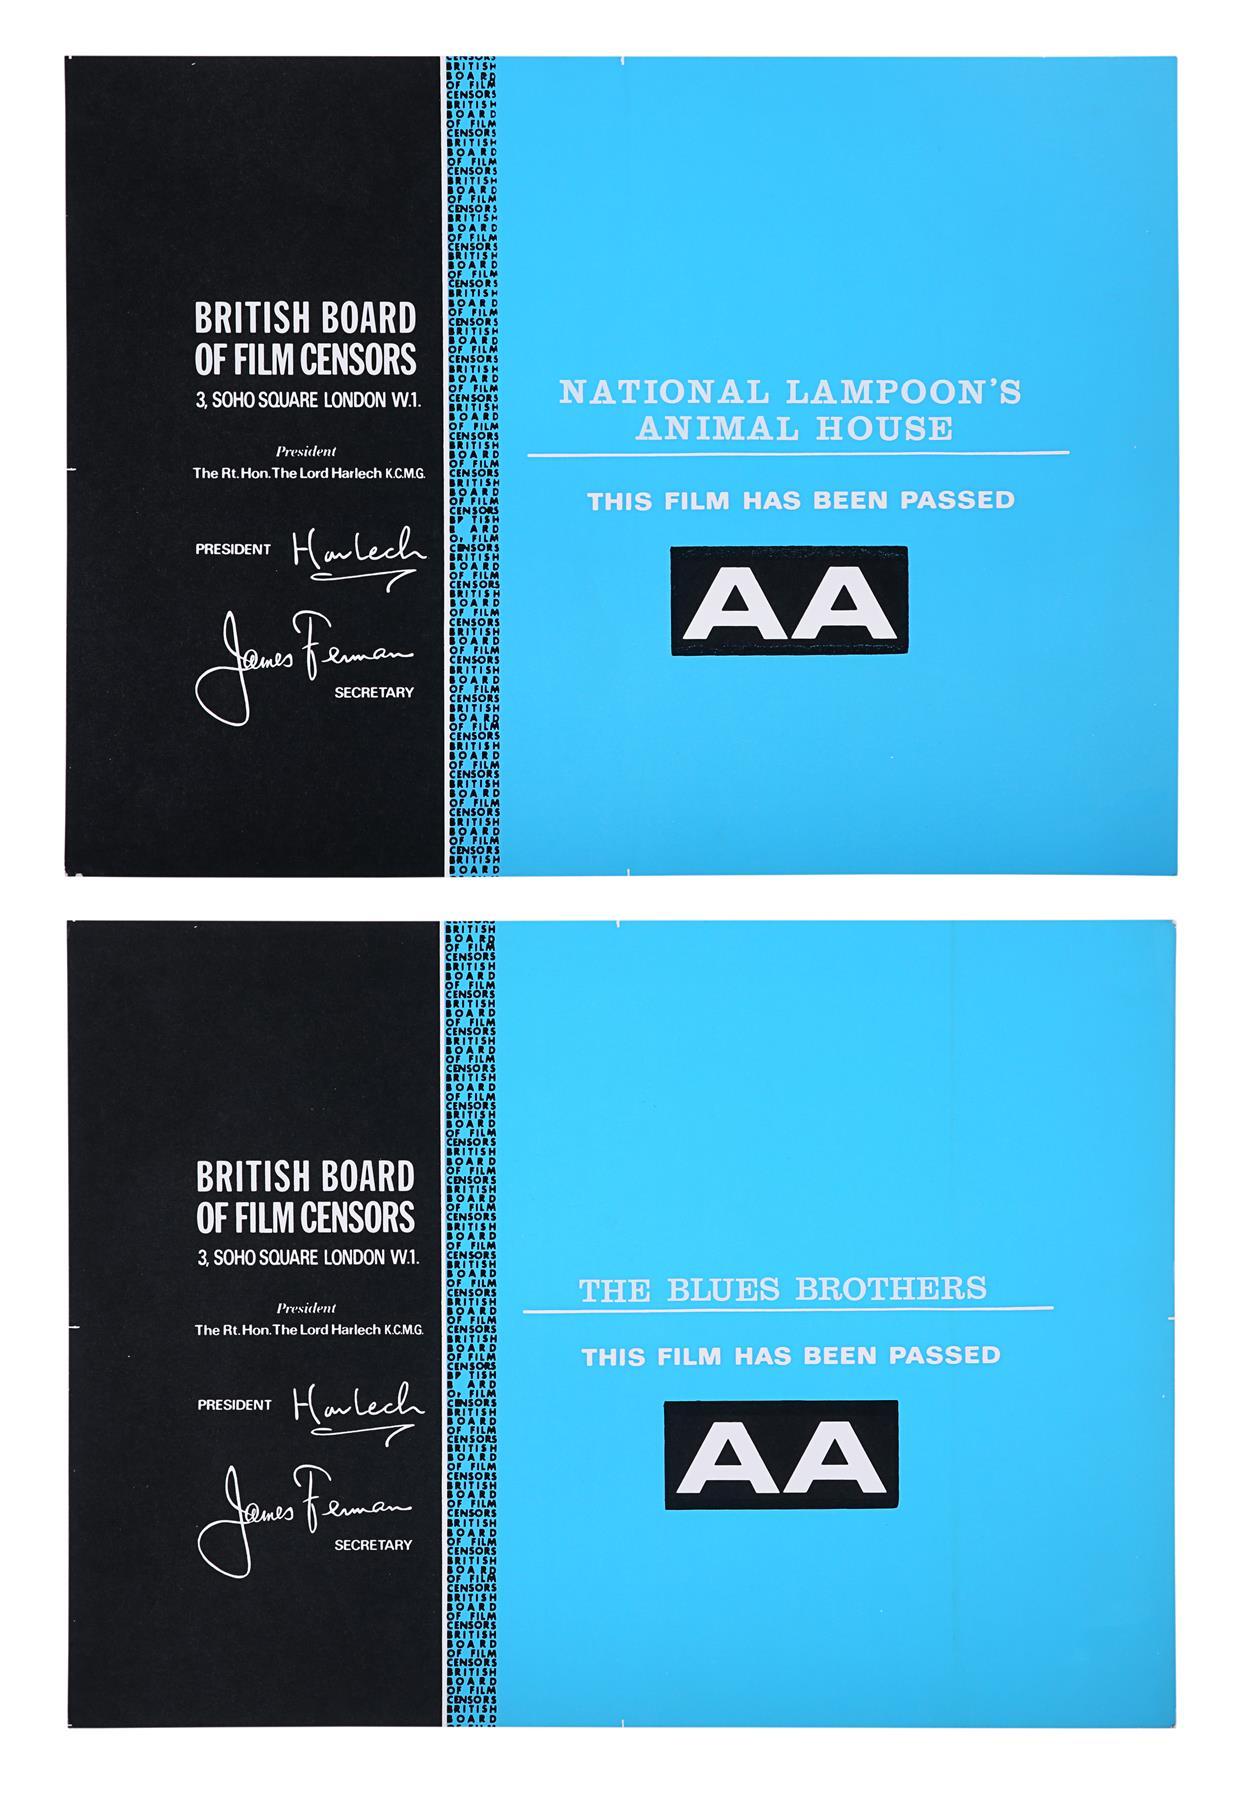 THE BLUES BROTHERS (1980), ANIMAL HOUSE (1978) - BBFC Certificates John Landis, 1978, 1980